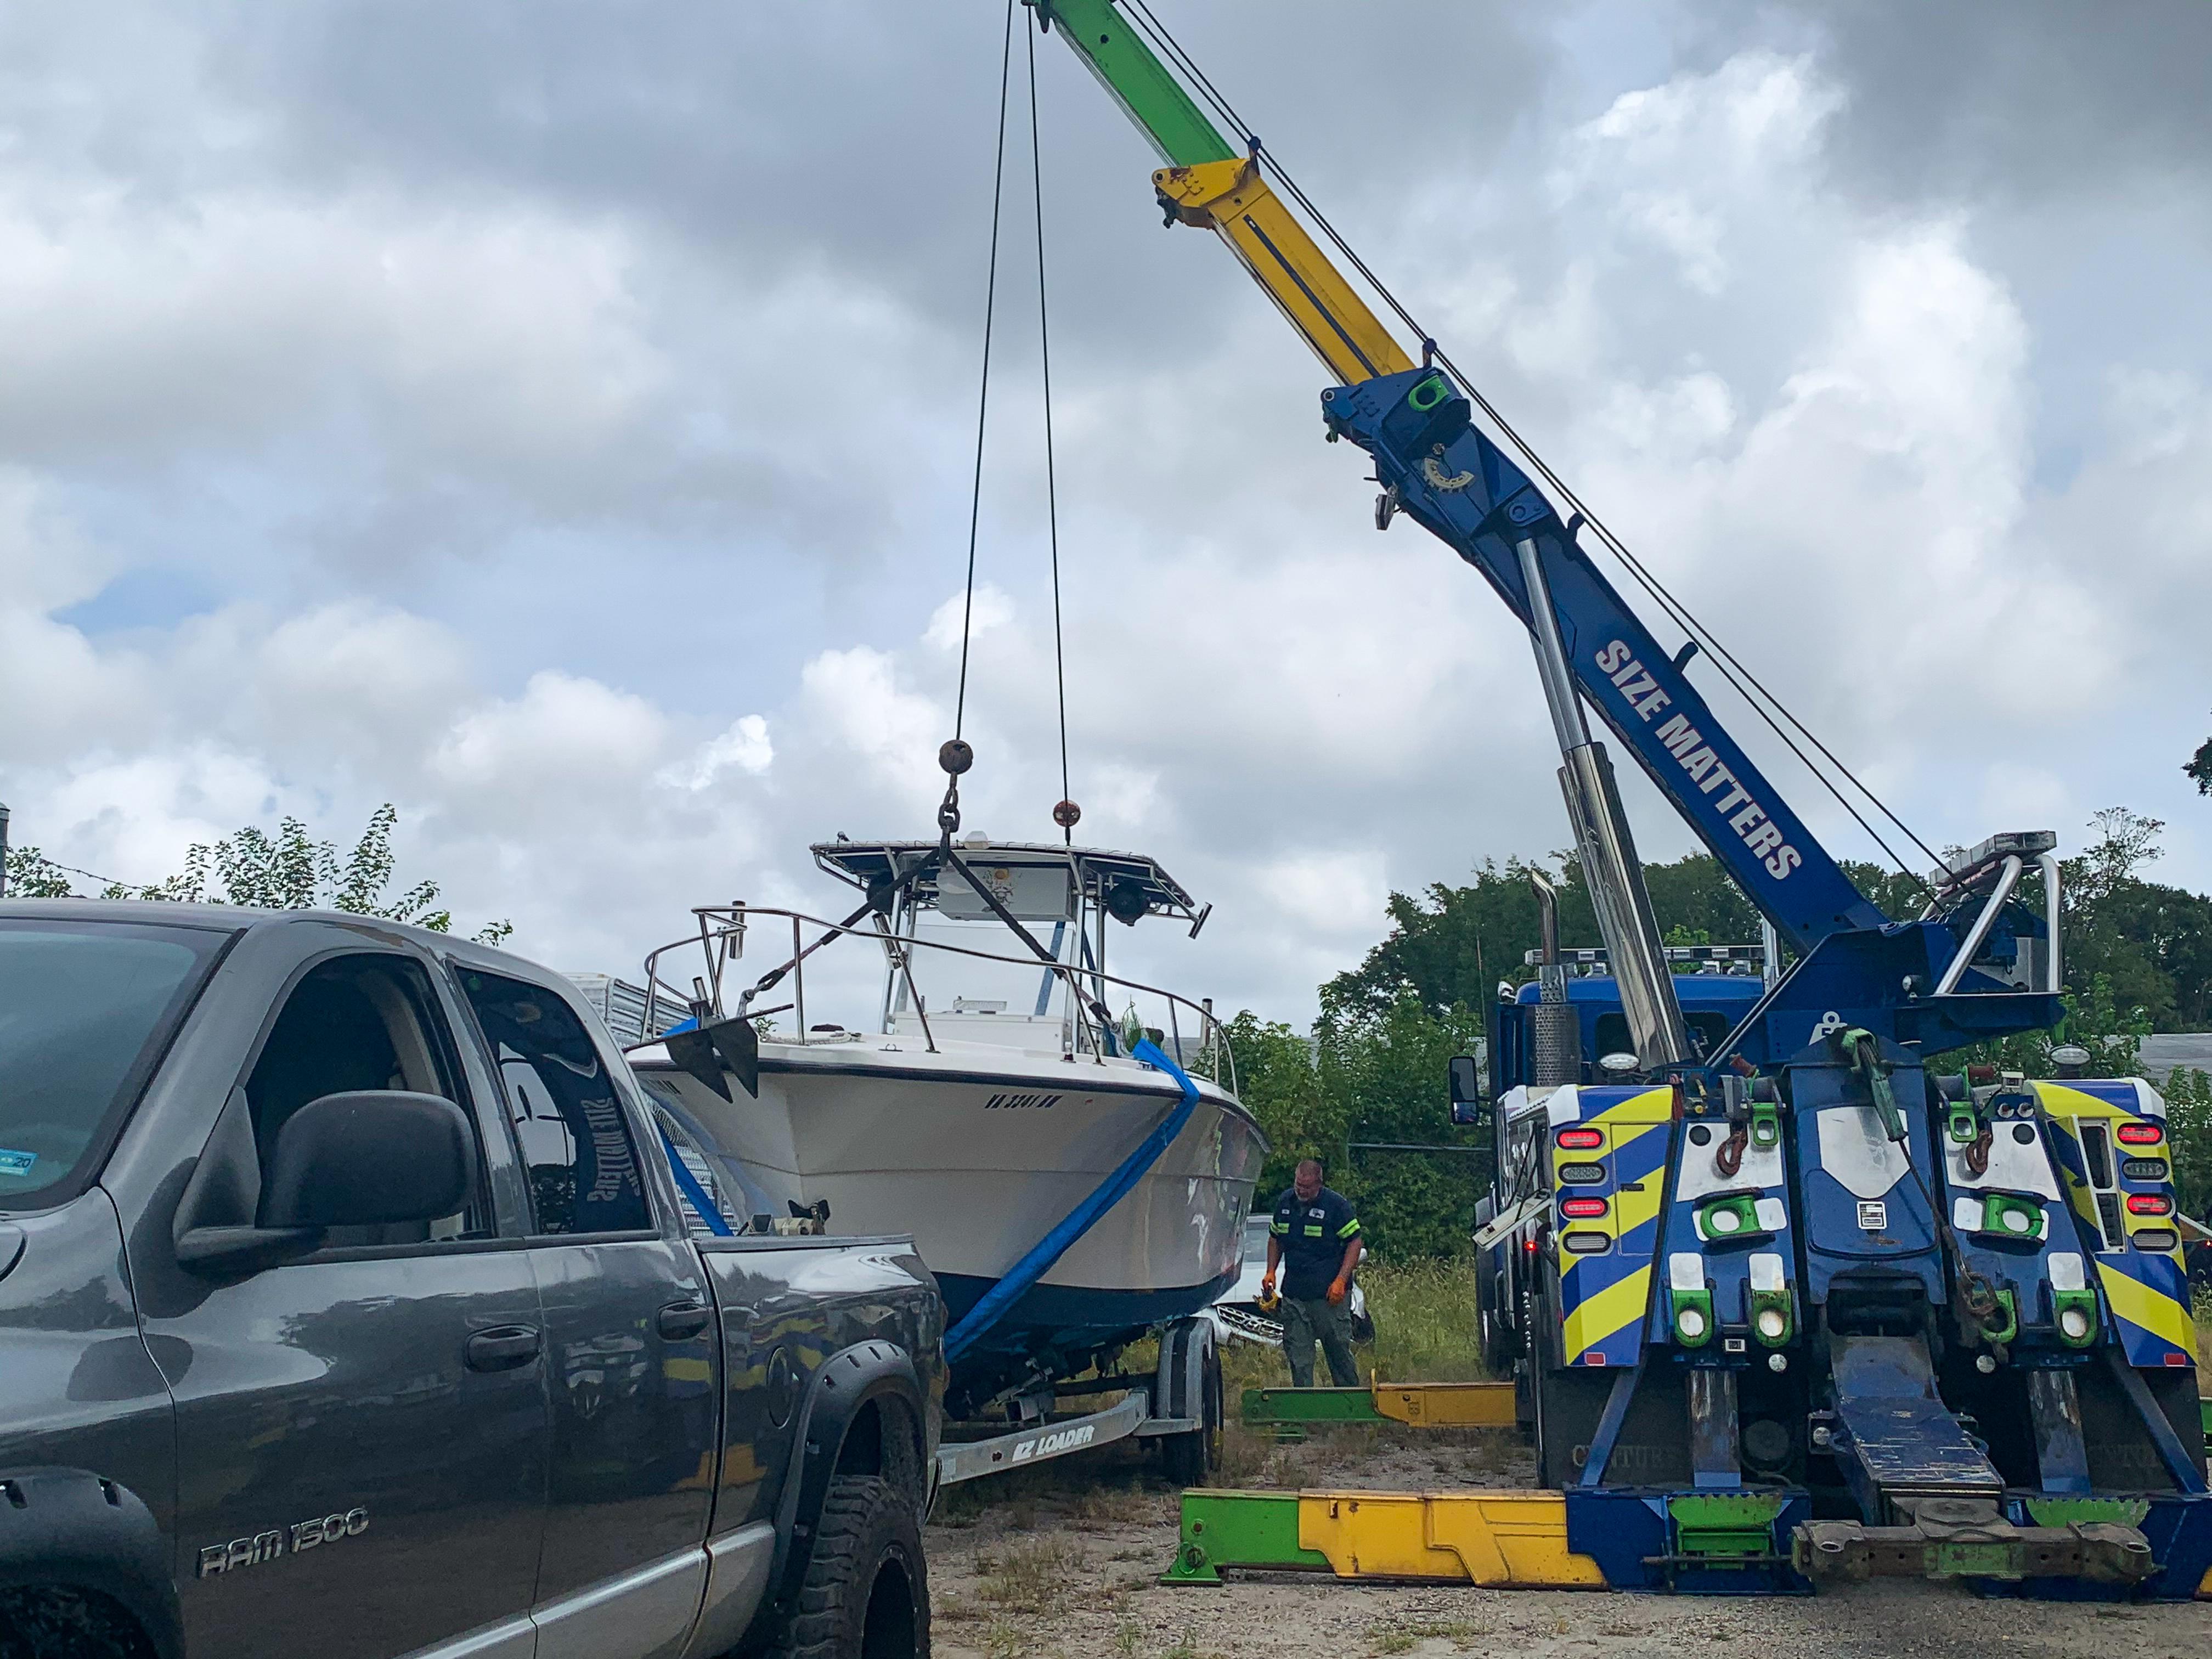 Service Description for Boat Towing Image